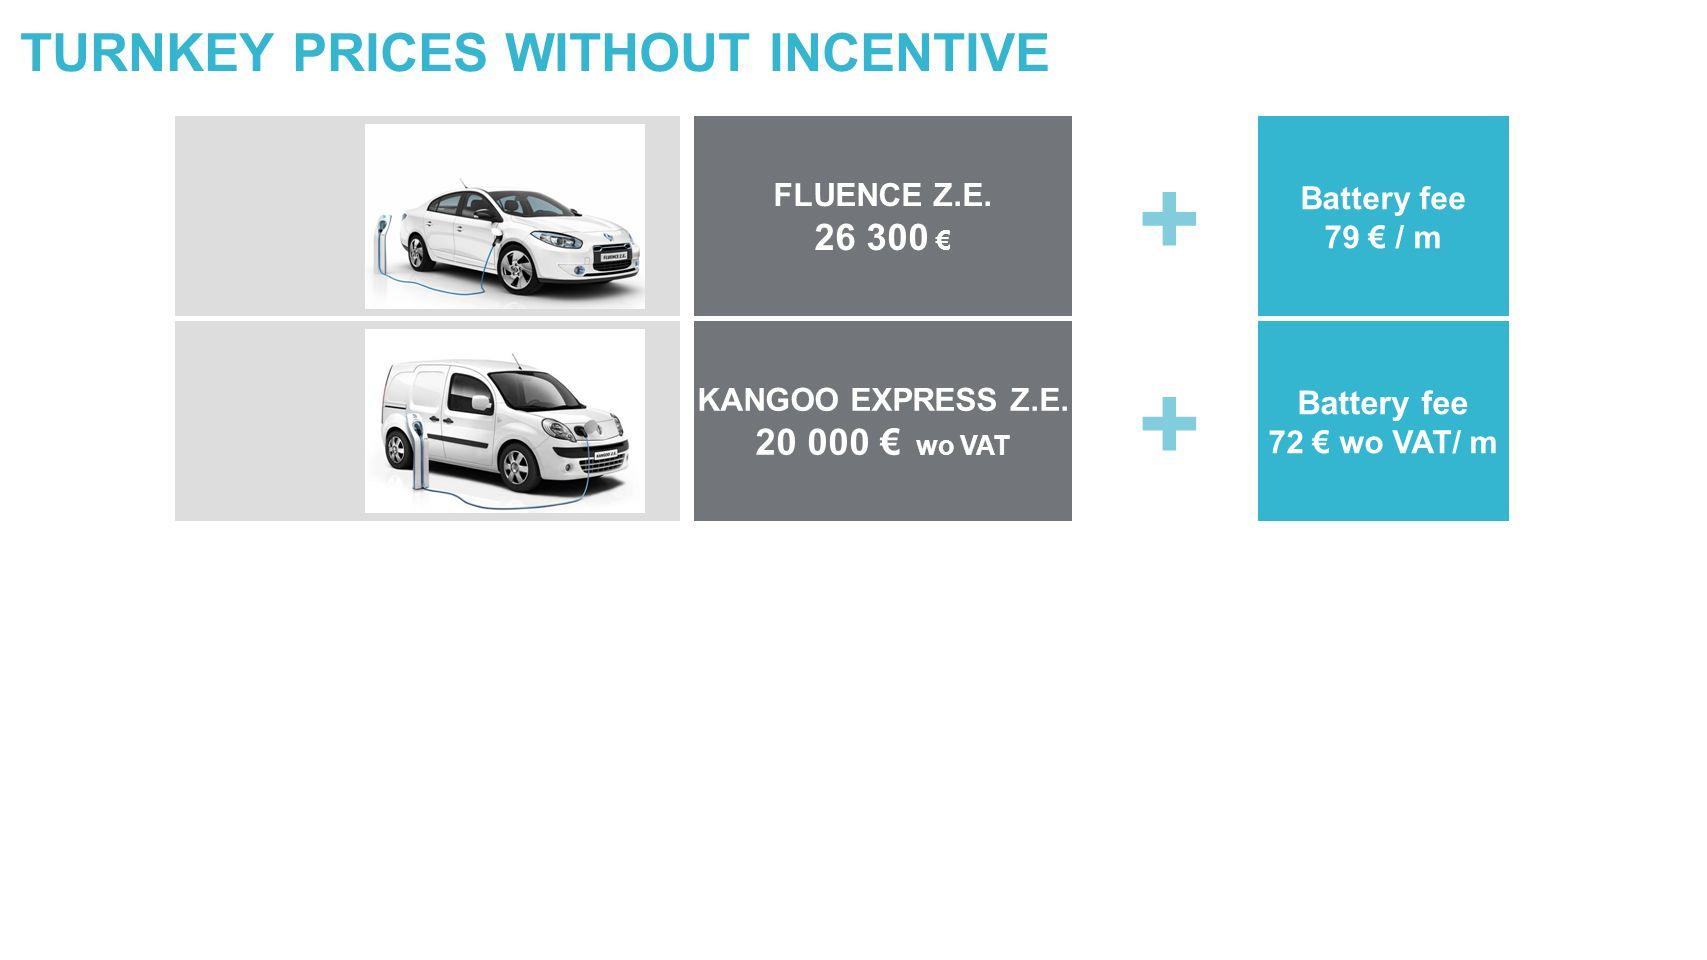 TURNKEY PRICES WITHOUT INCENTIVE + + FLUENCE Z.E. 26 300 KANGOO EXPRESS Z.E.